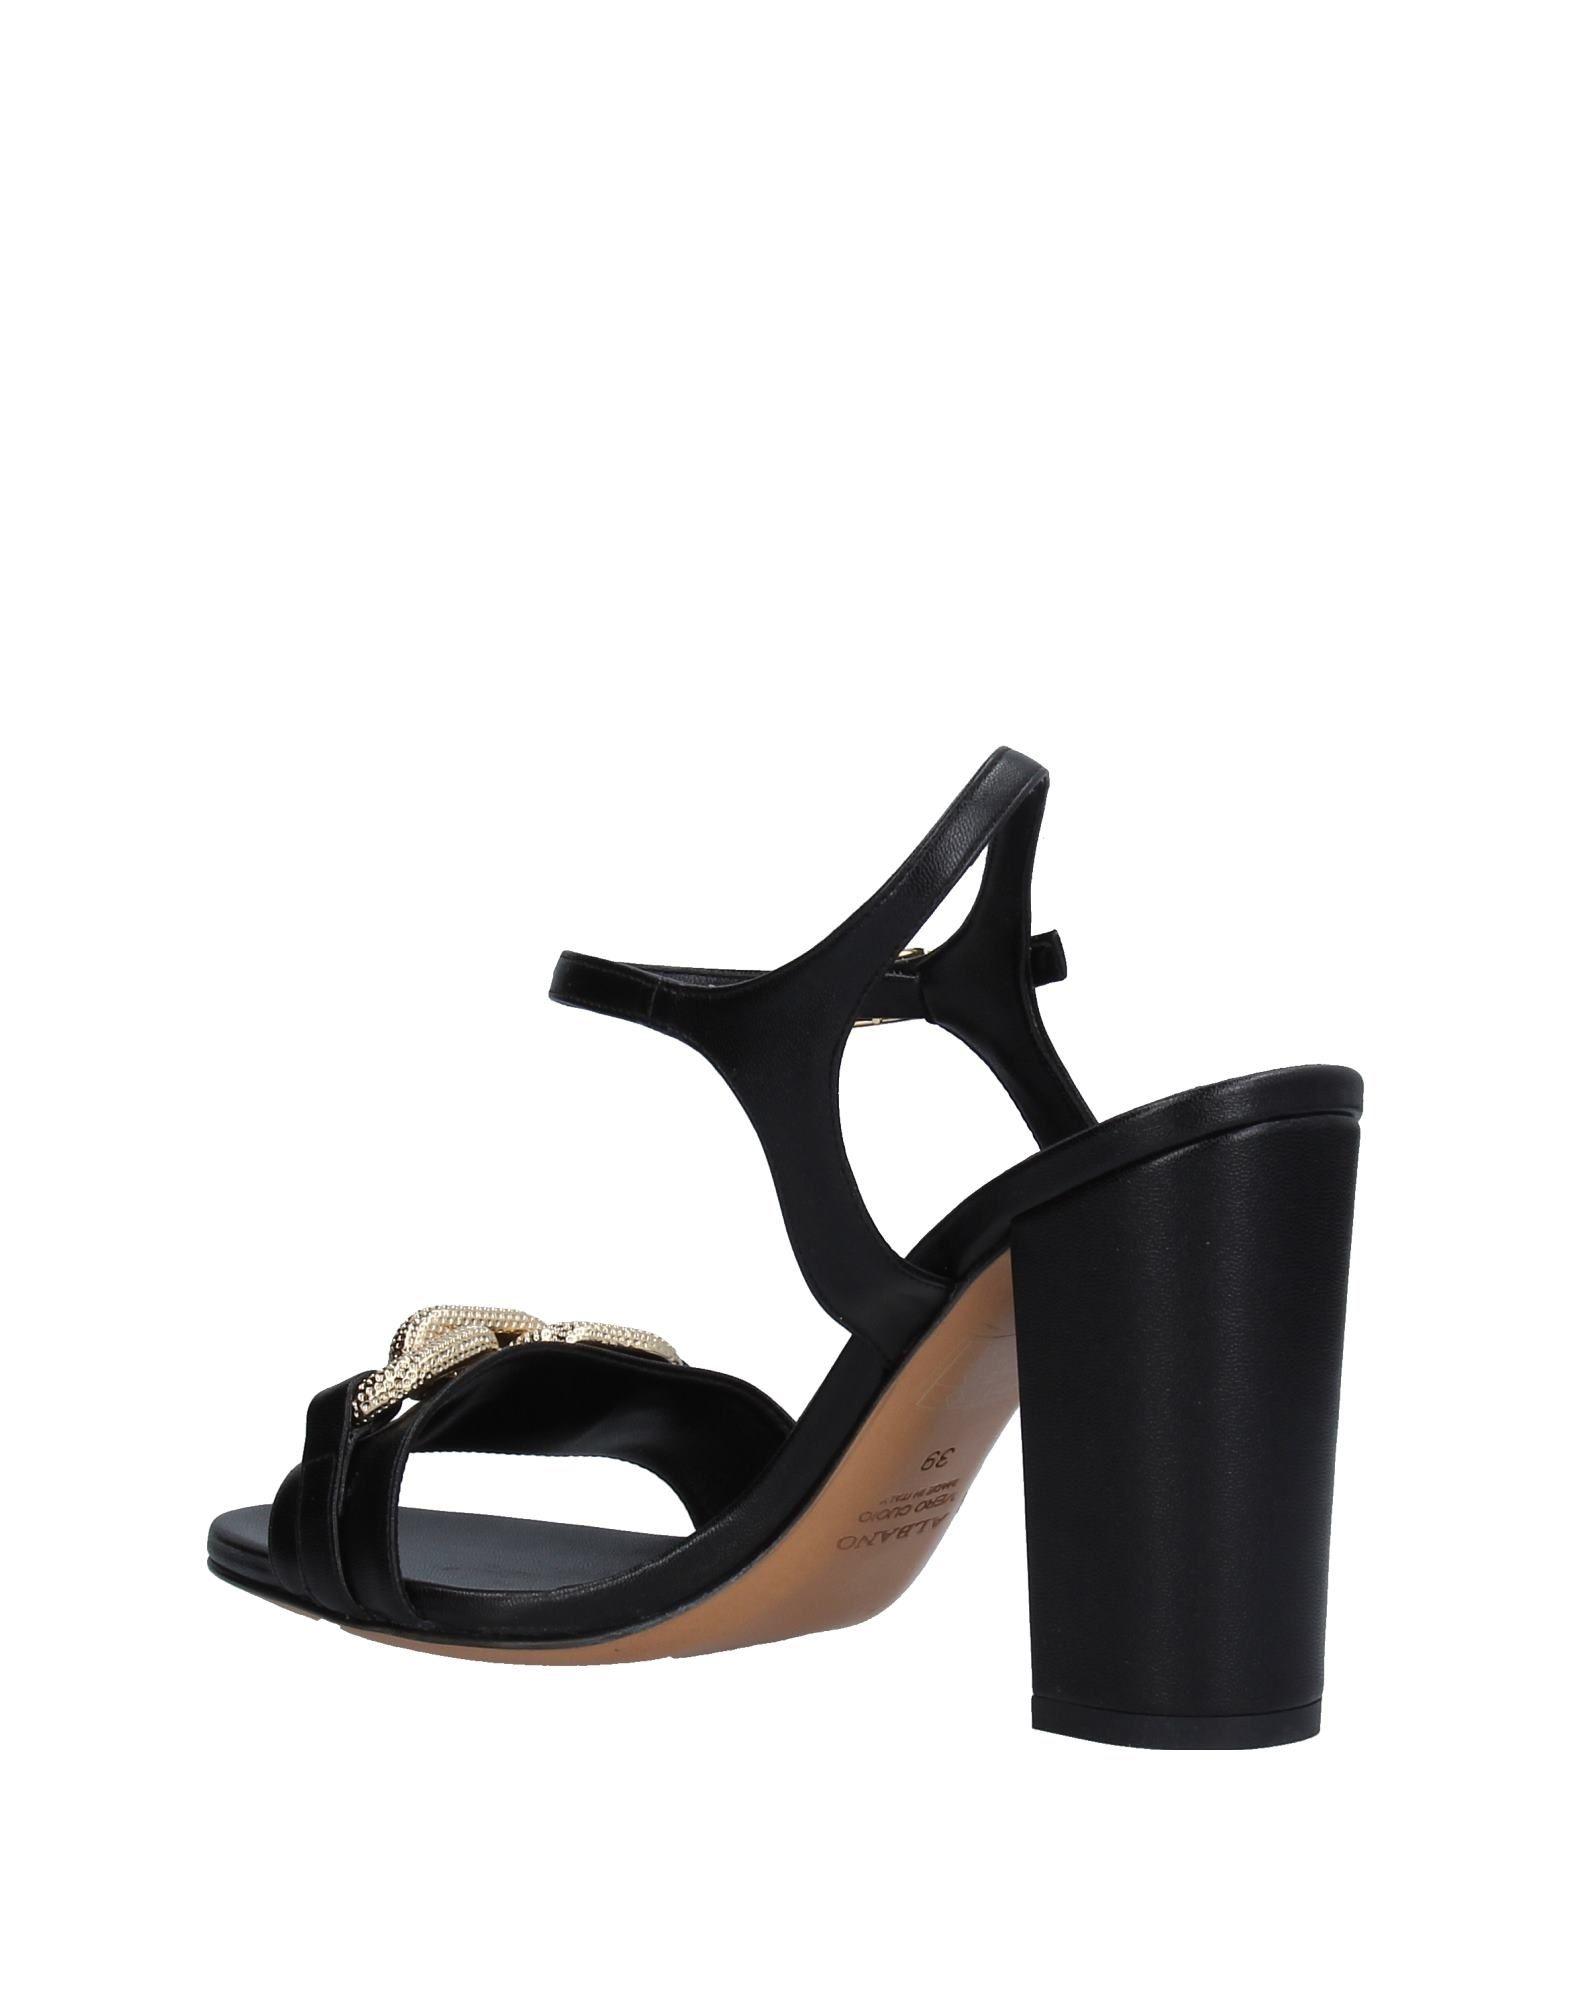 Albano Sandalen Gute Damen  11233493EX Gute Sandalen Qualität beliebte Schuhe 6003b5